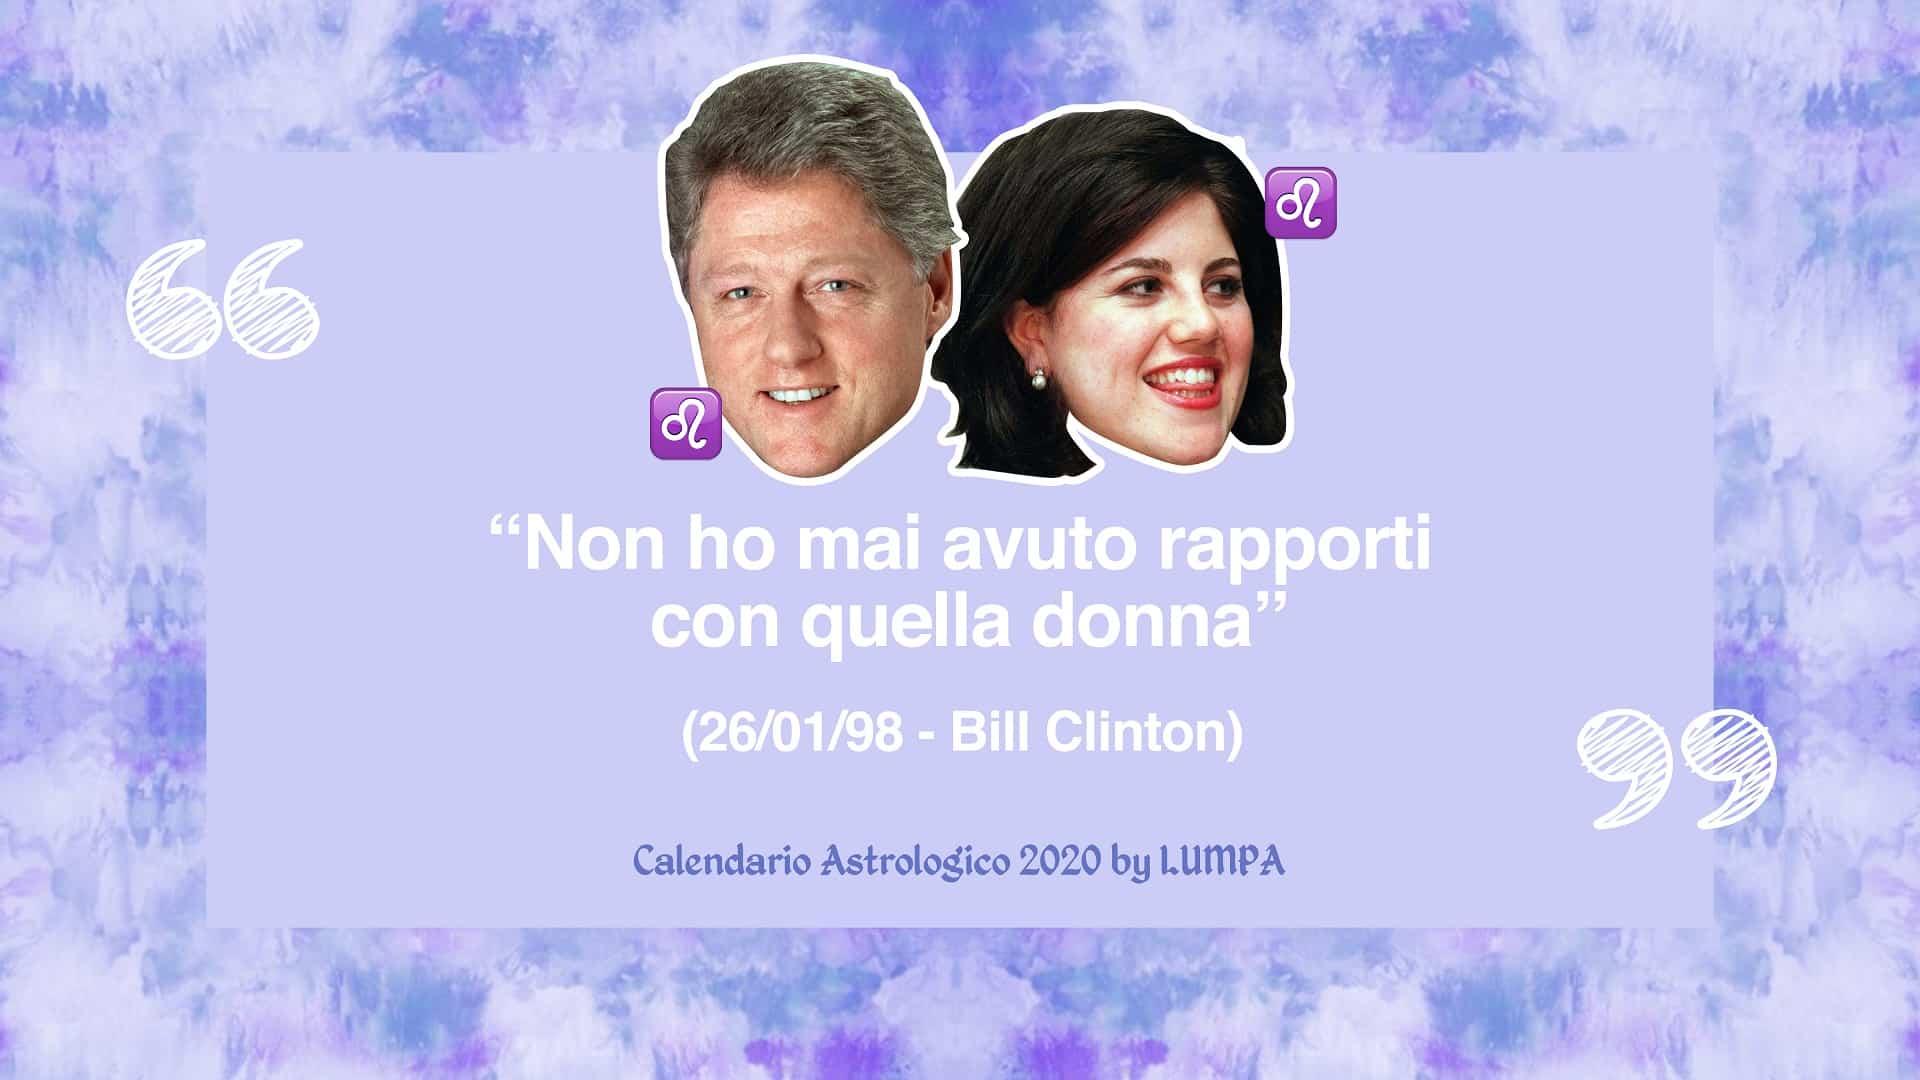 Calendario Astrologico 2020 by Lumpa